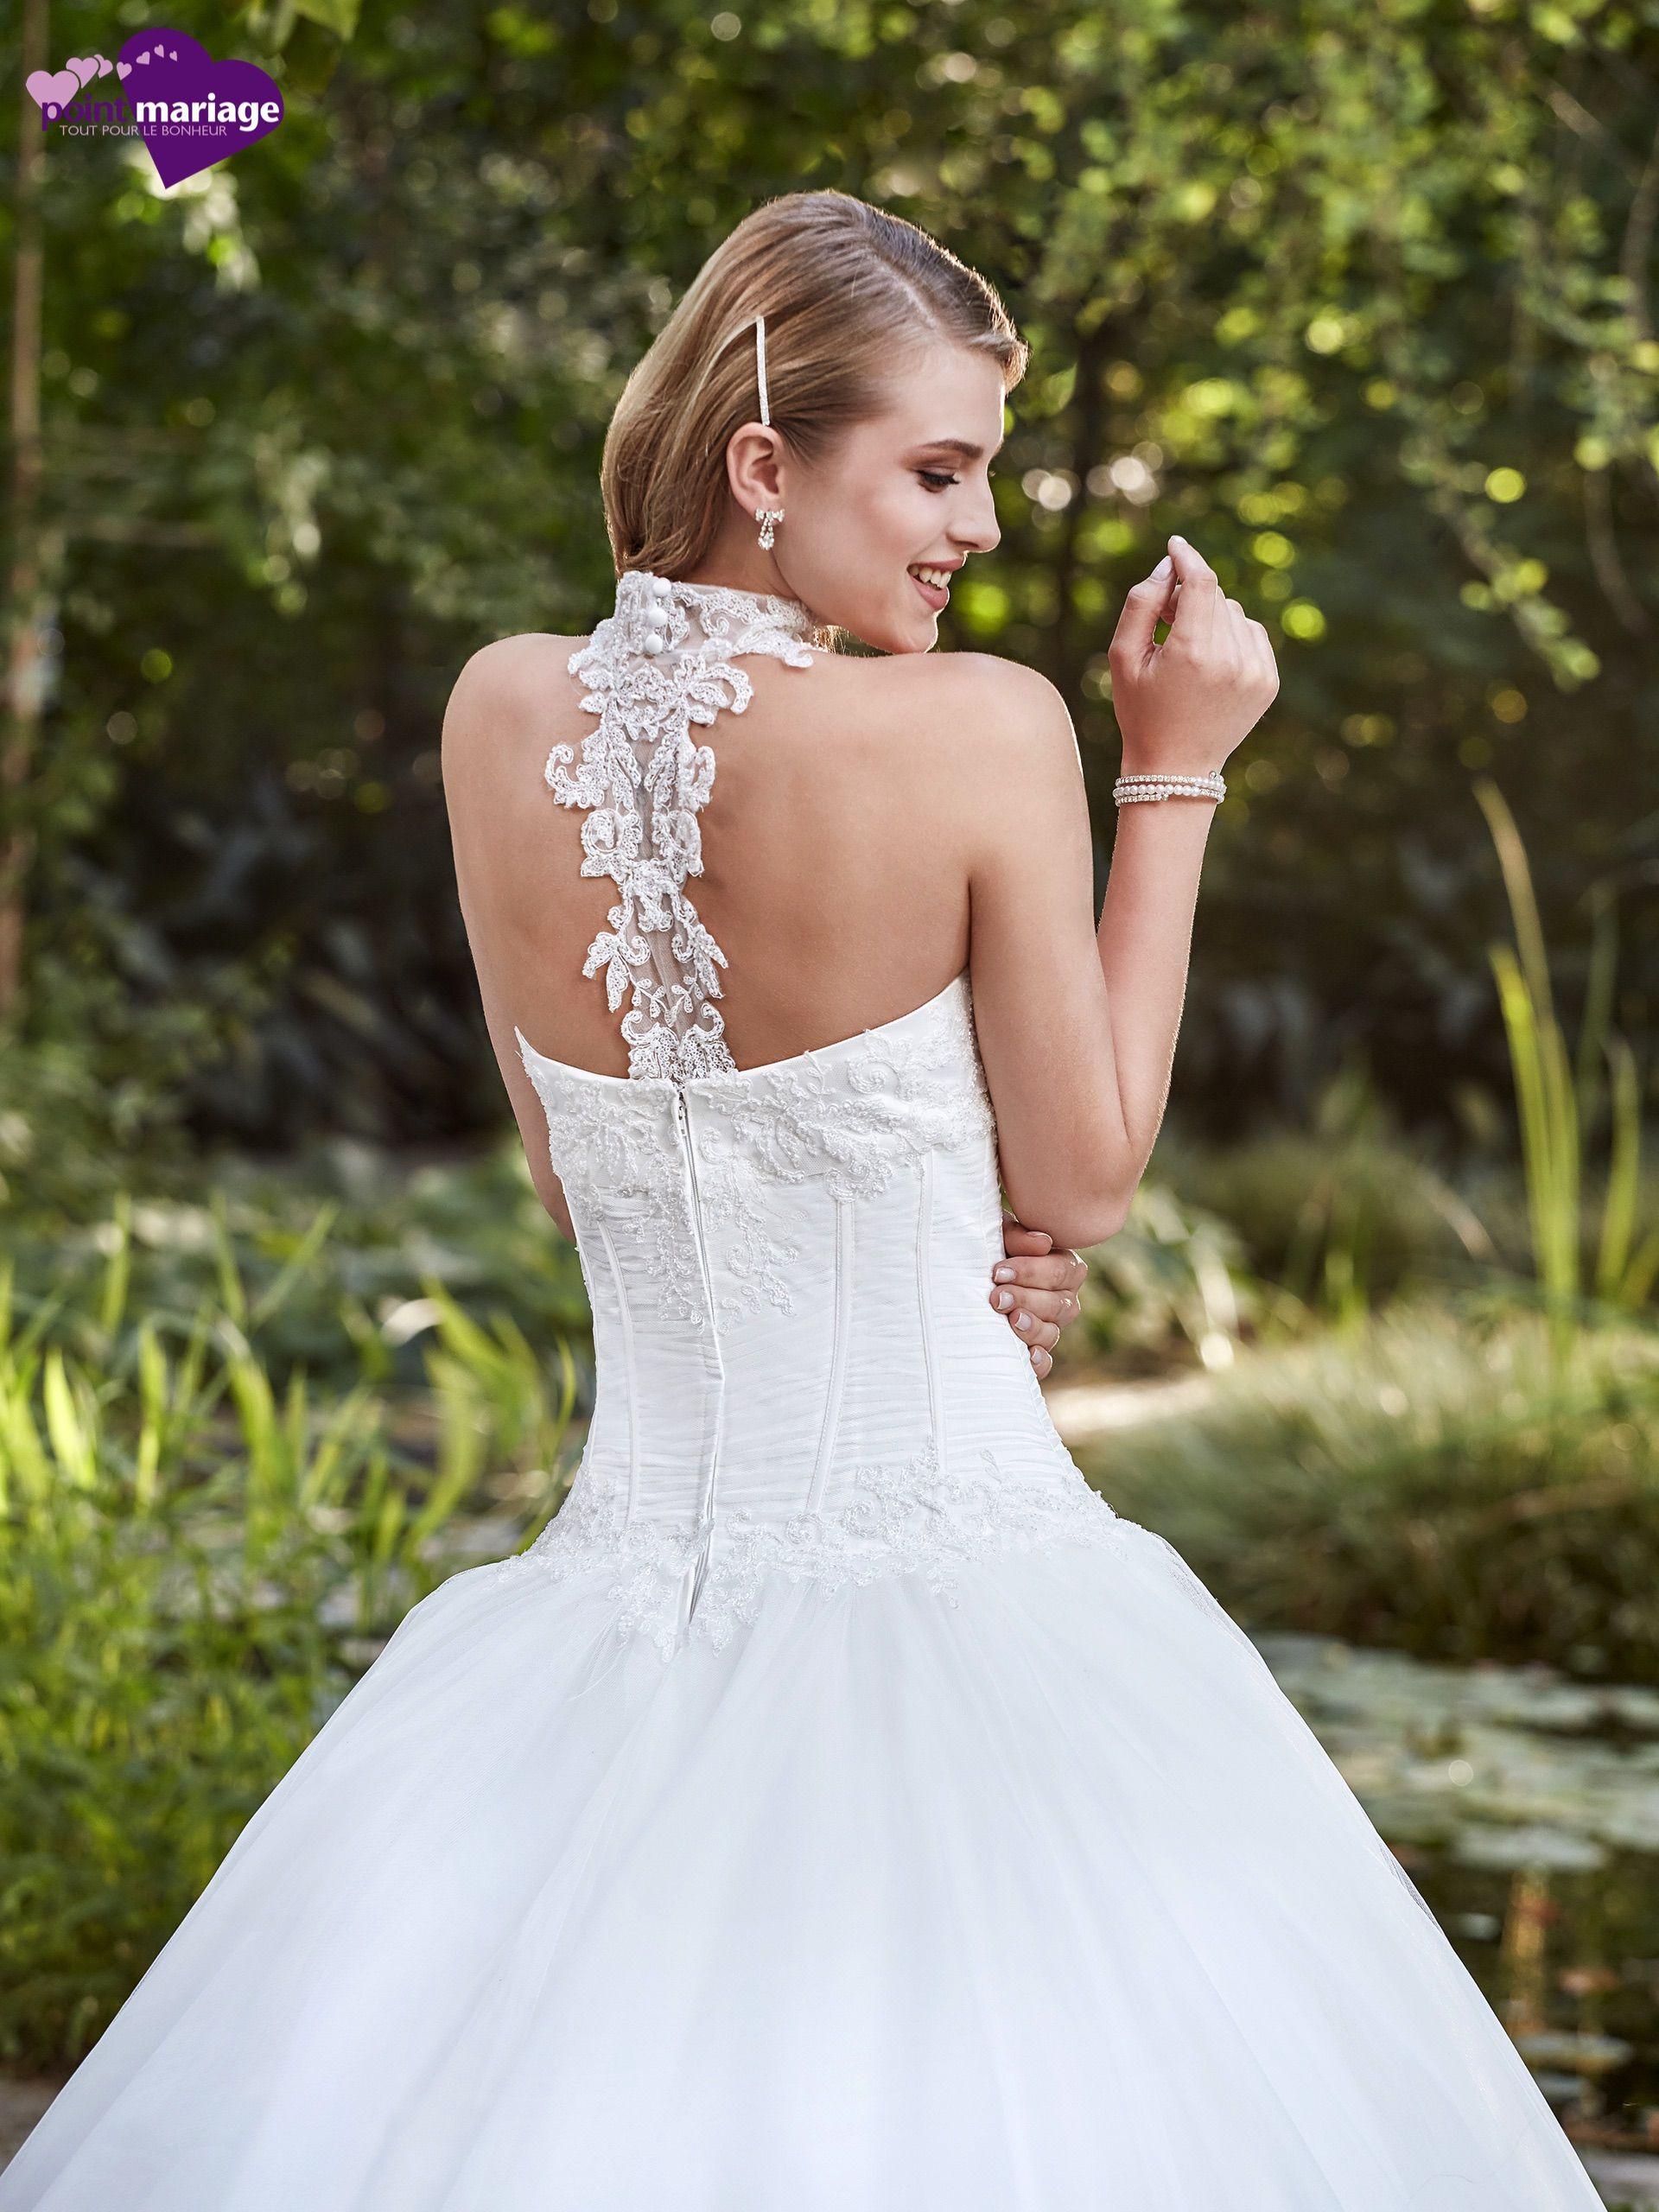 Nice dresses for wedding  Robe de mariée Zita  Wedding in   Pinterest  Wedding and Robe